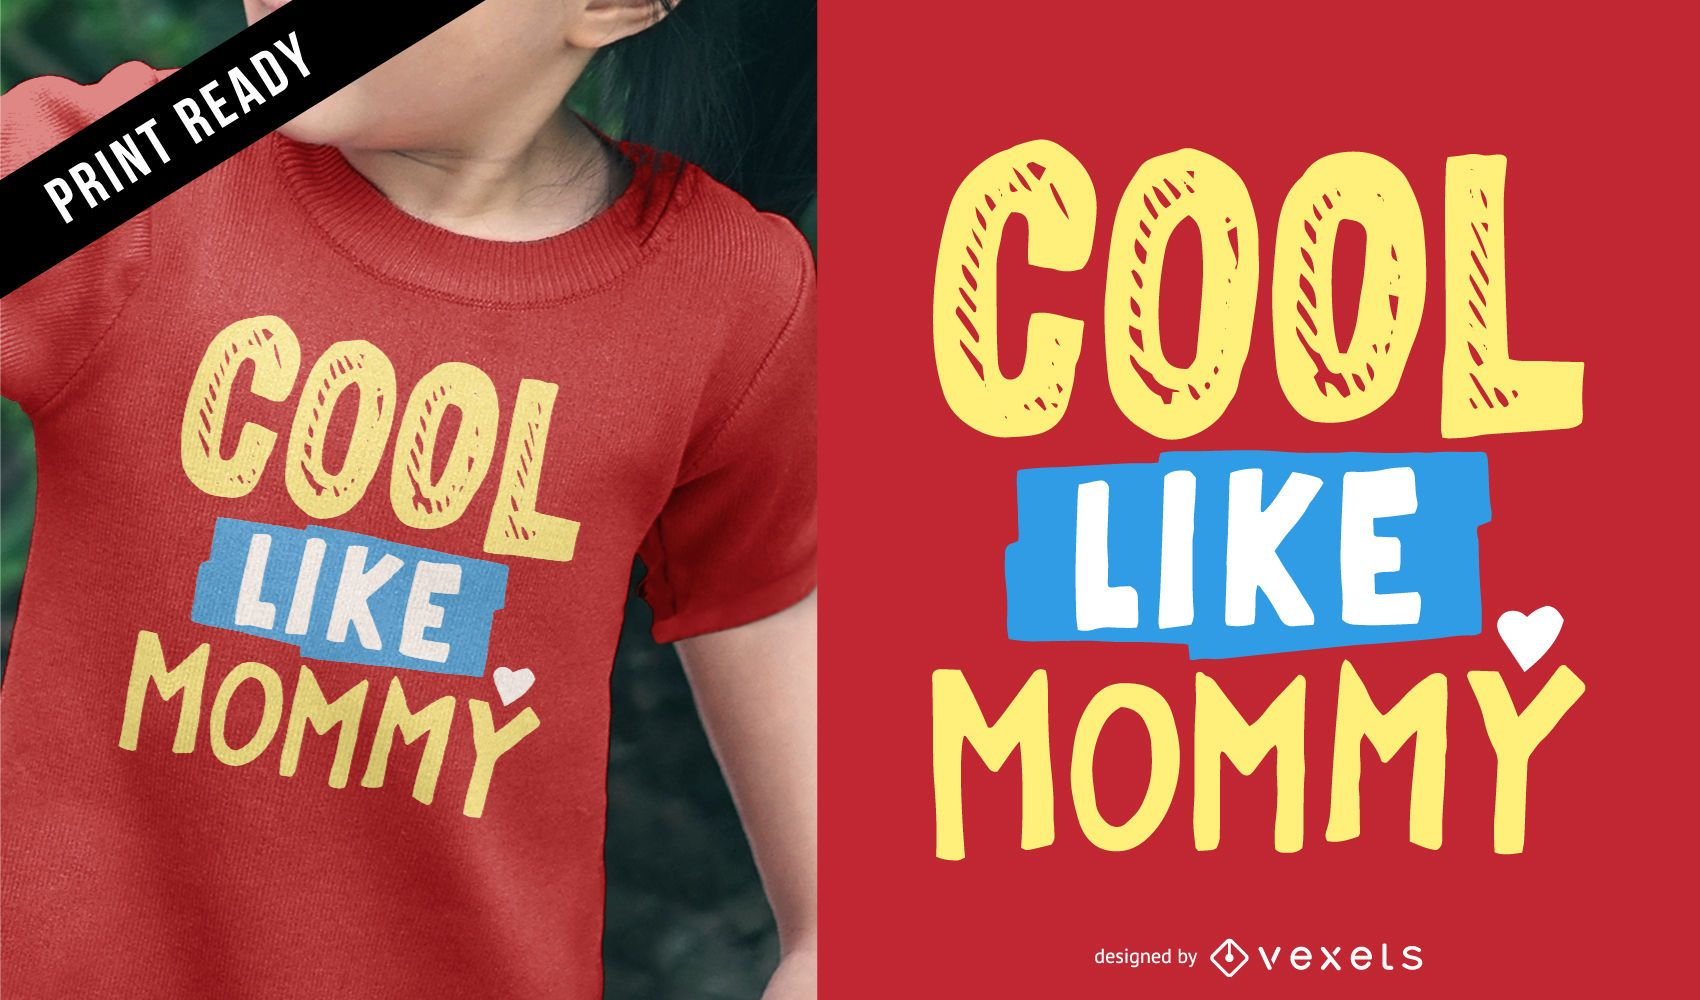 Cool mommy kids t-shirt design